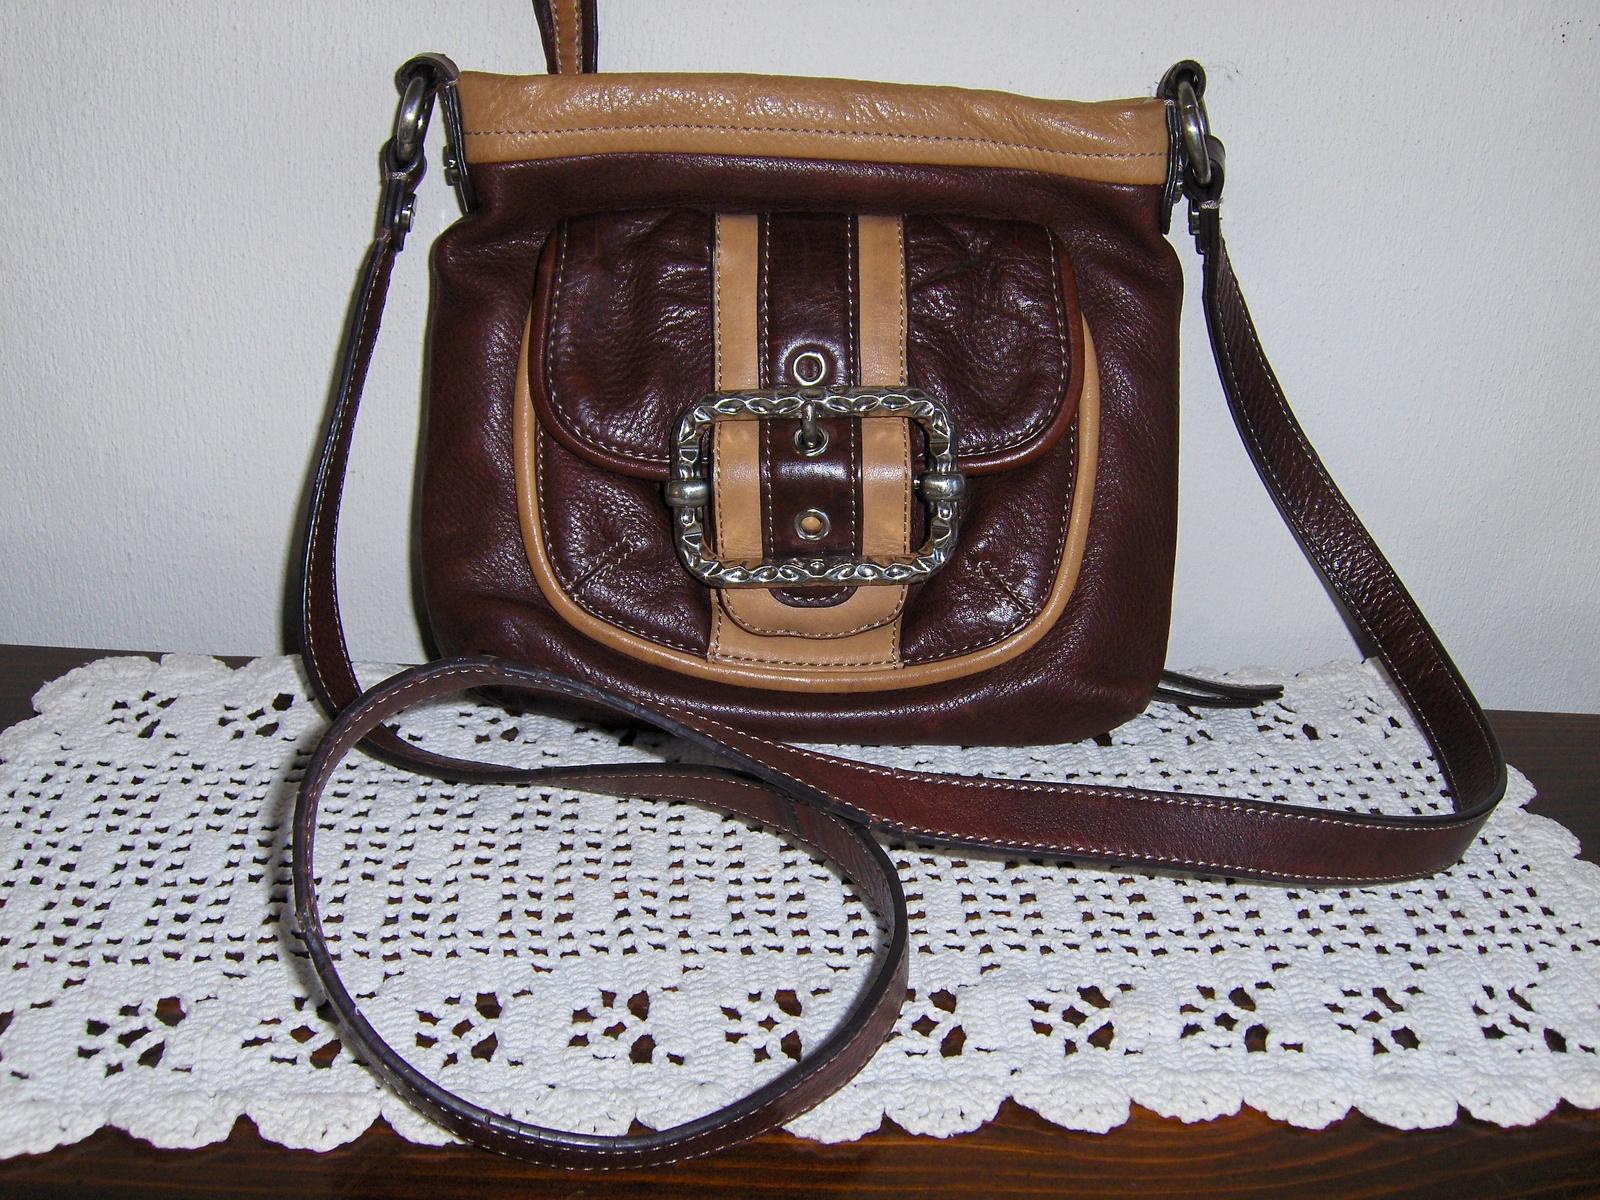 B Makowsky Bag 4 Customer Reviews And